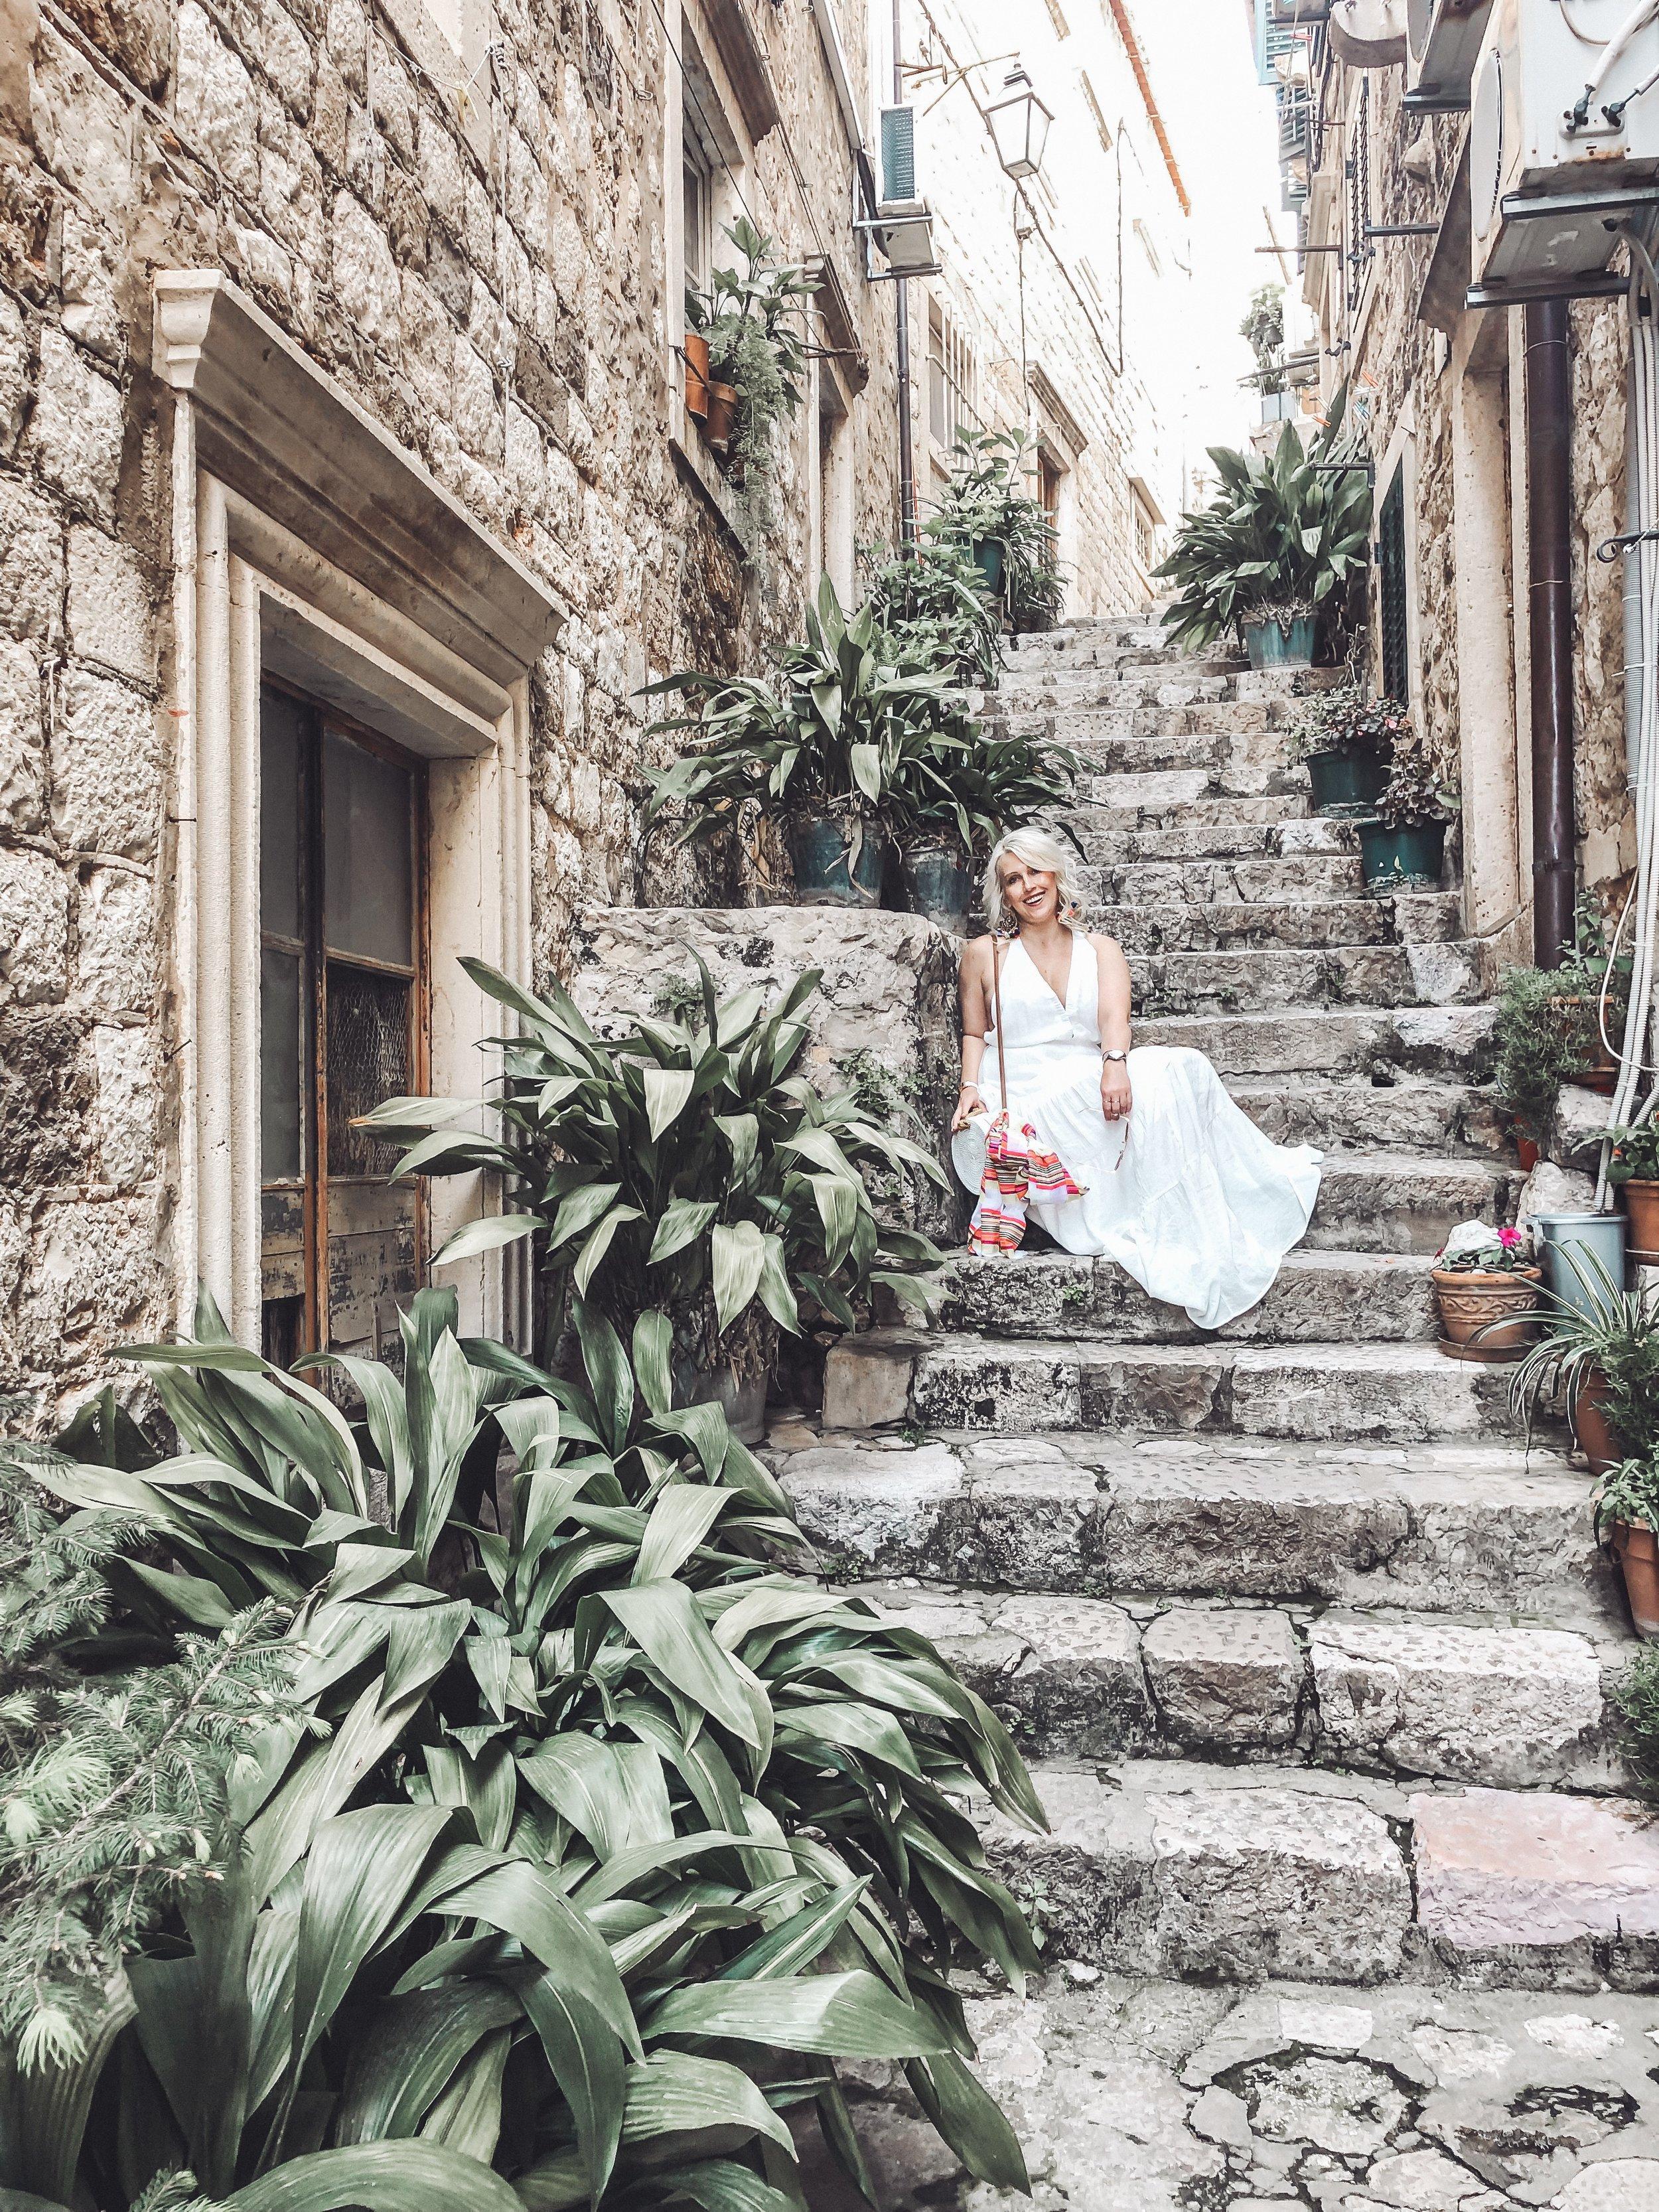 Beauty Is Everywhere In Dubrovnik